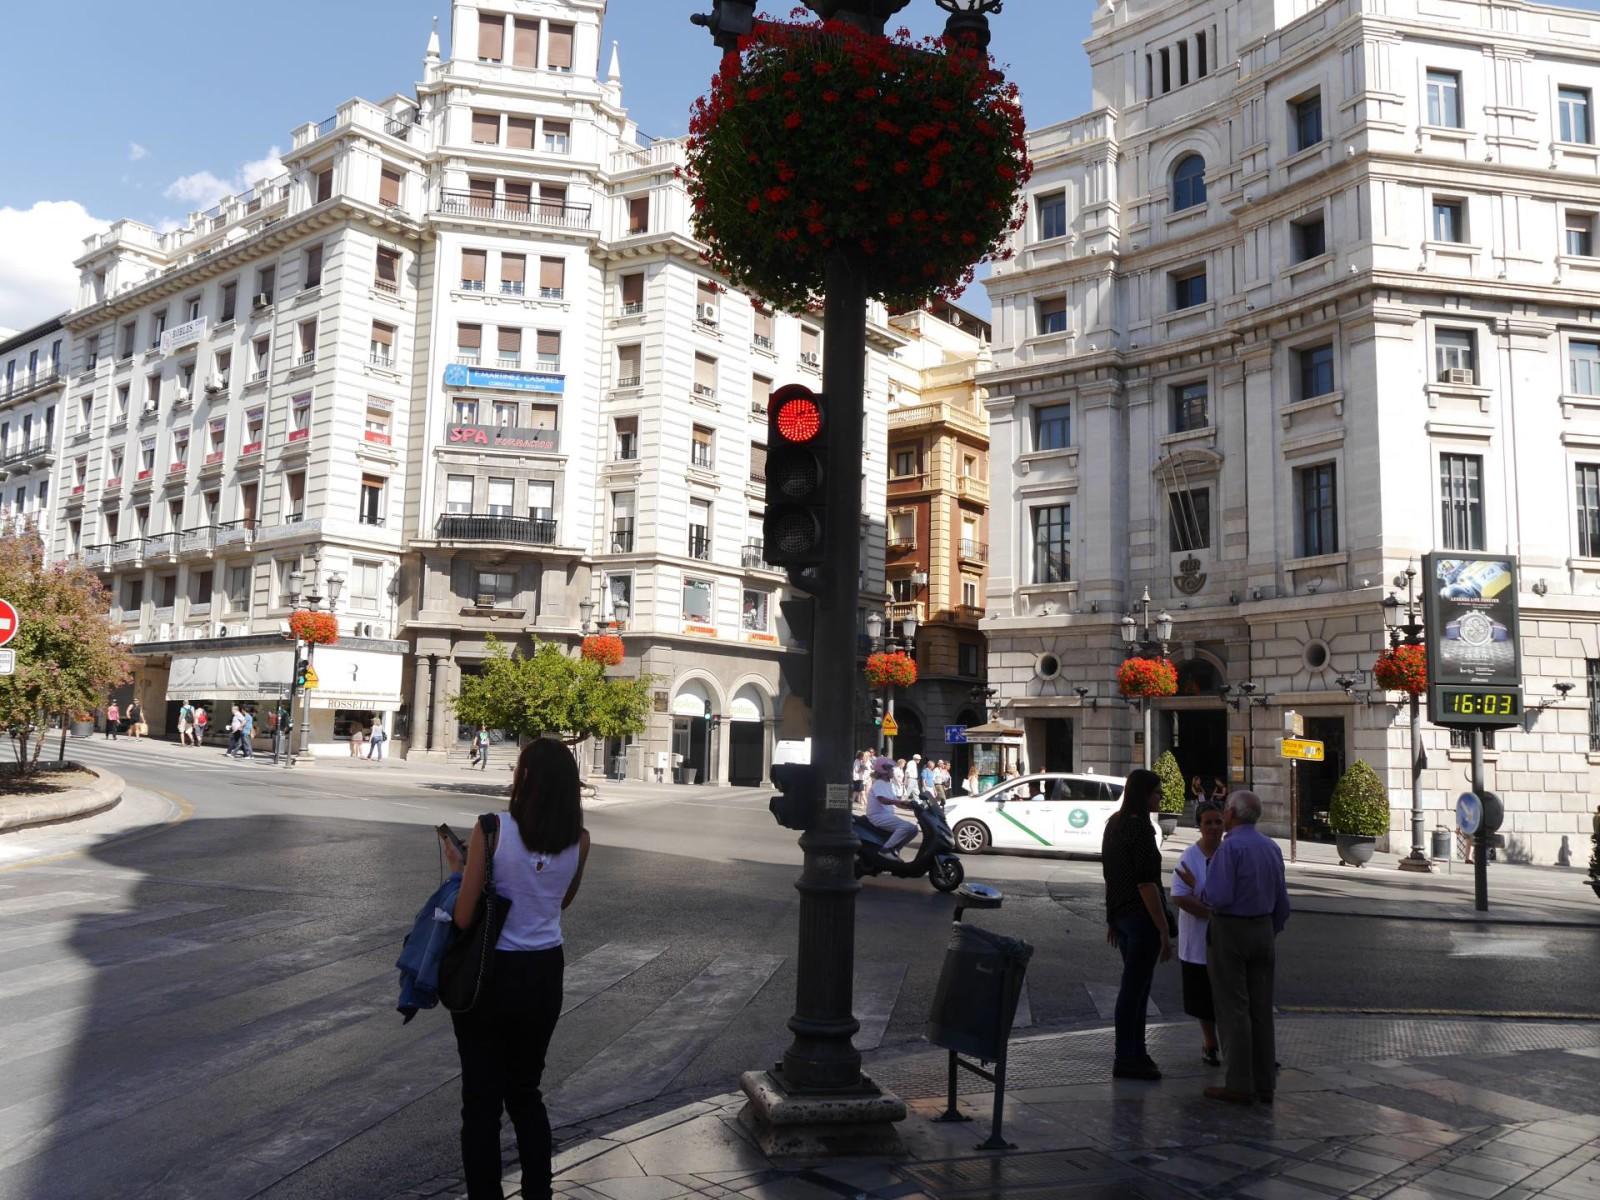 granada-city-centre-spain